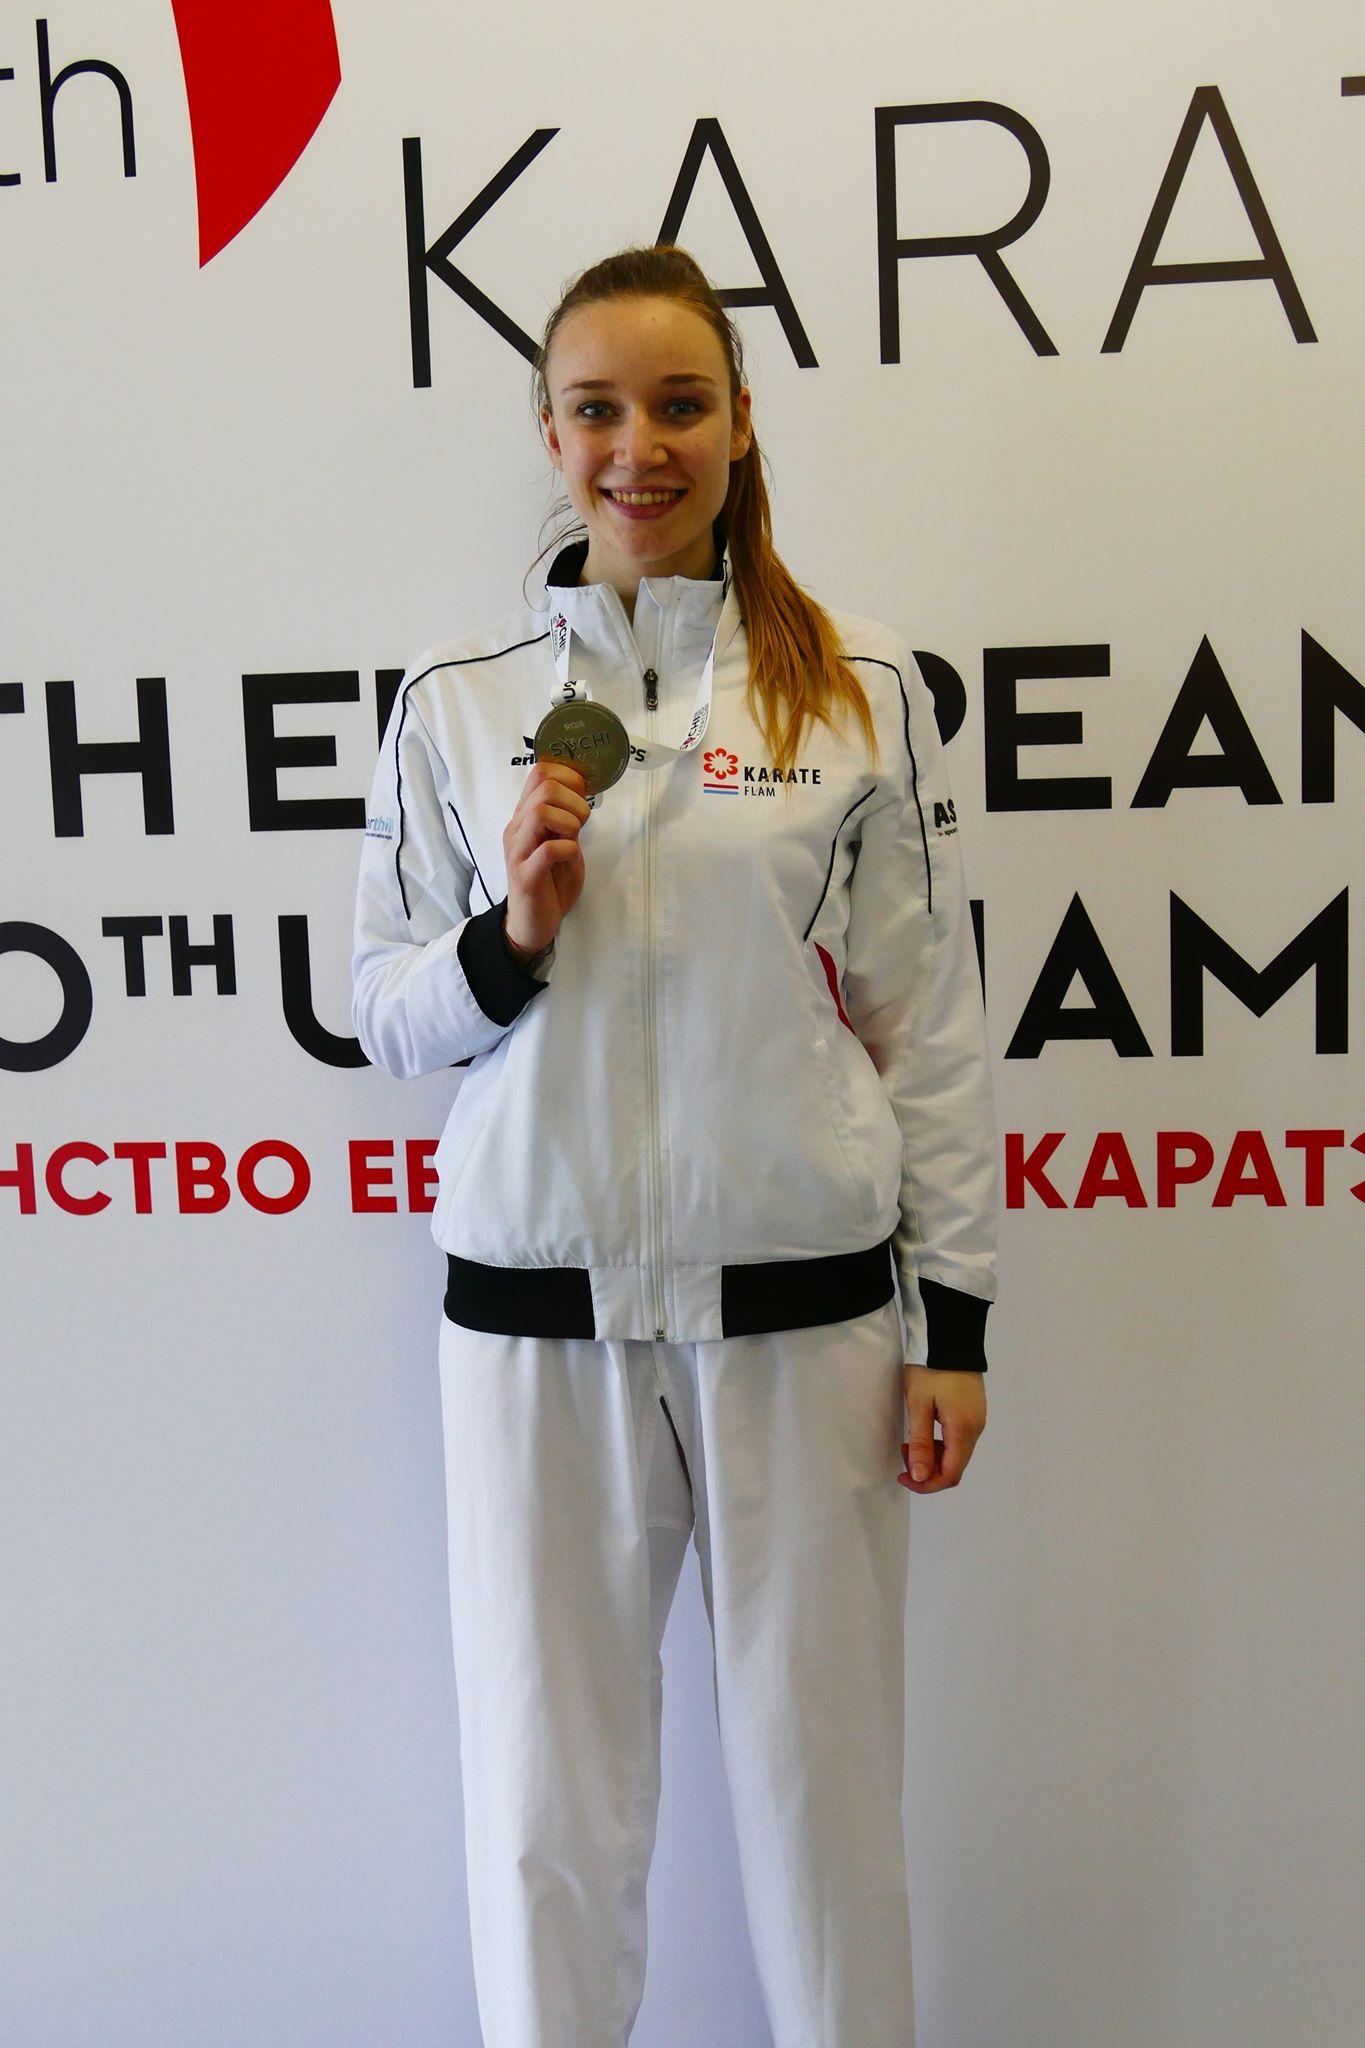 Berna Allison Vice Championne d'Europe